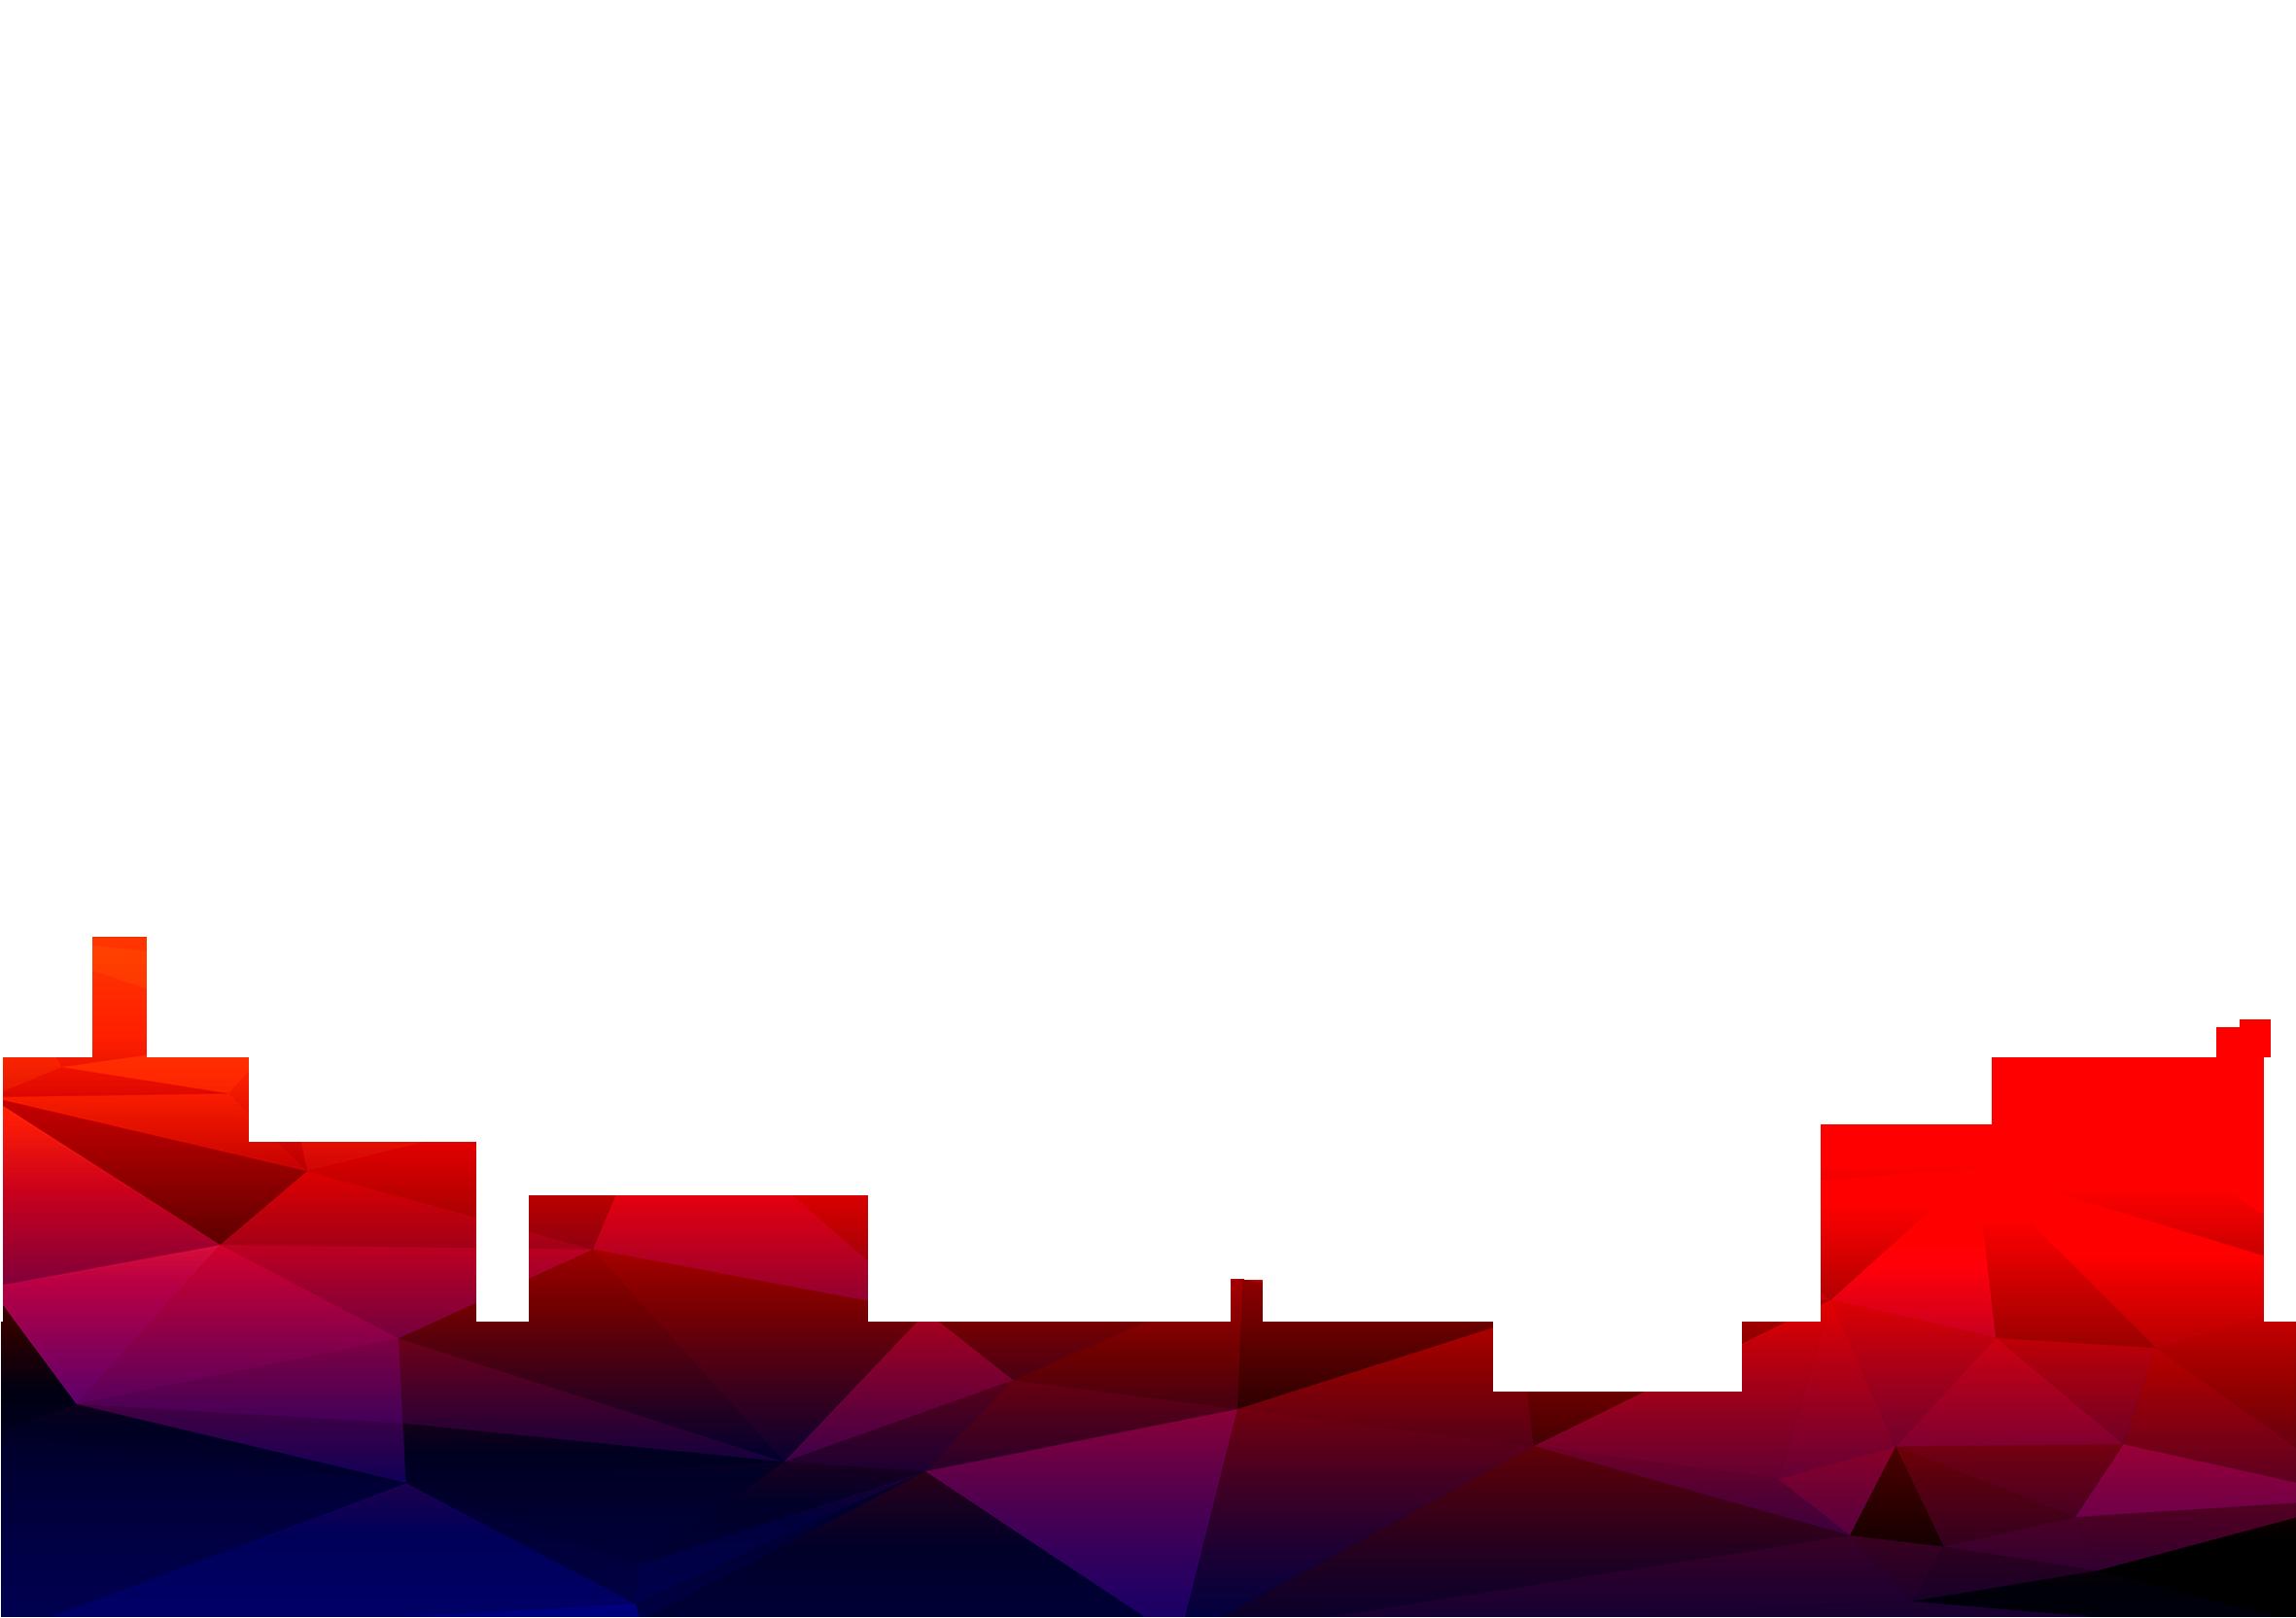 Clipart music concert. Transparent image city background